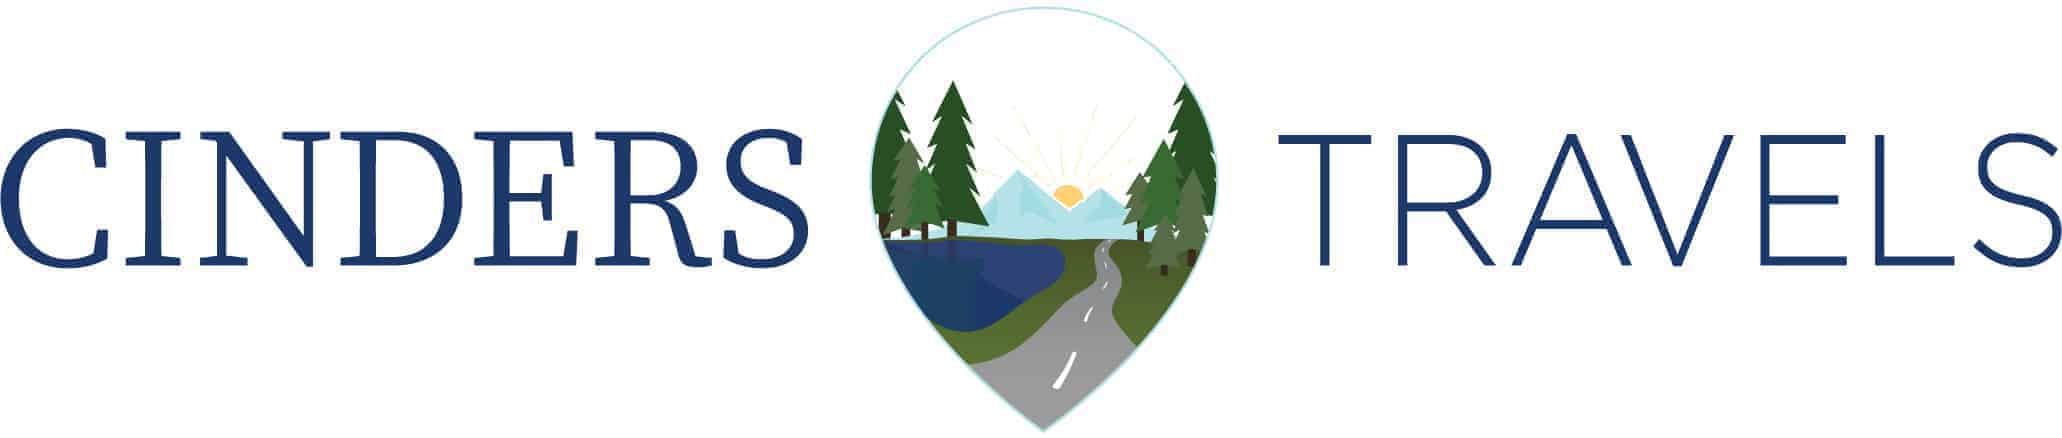 Cinders Travels Website Logo